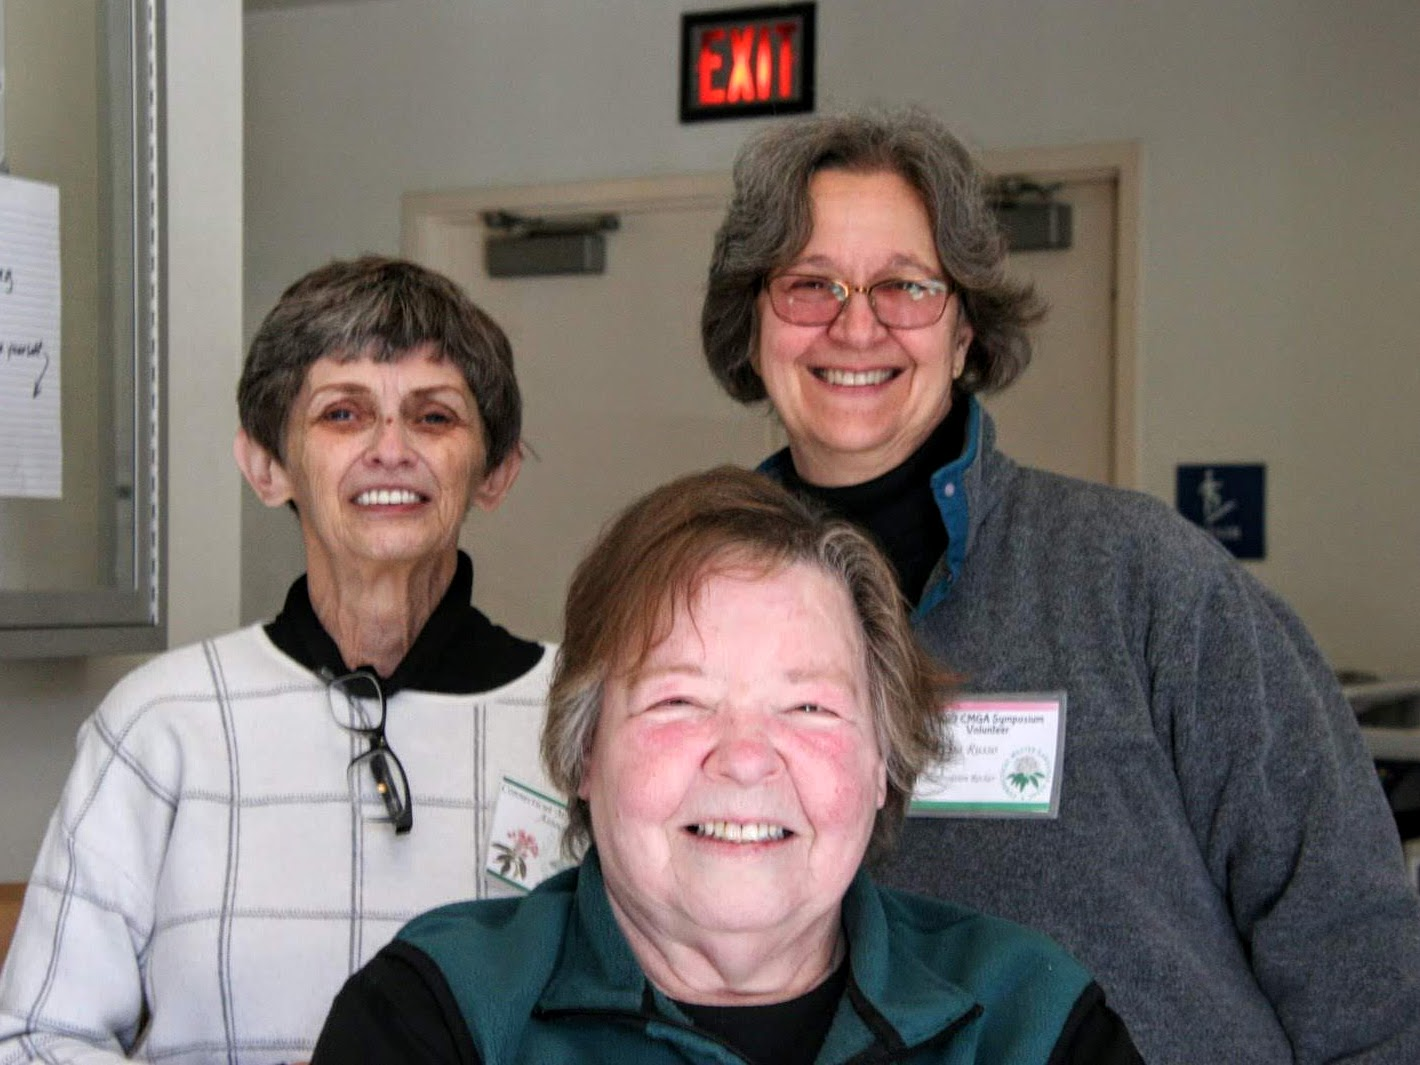 Pat Taylor (treasurer), Kathy Culhane (secretary), Paula Russo (registration chair)